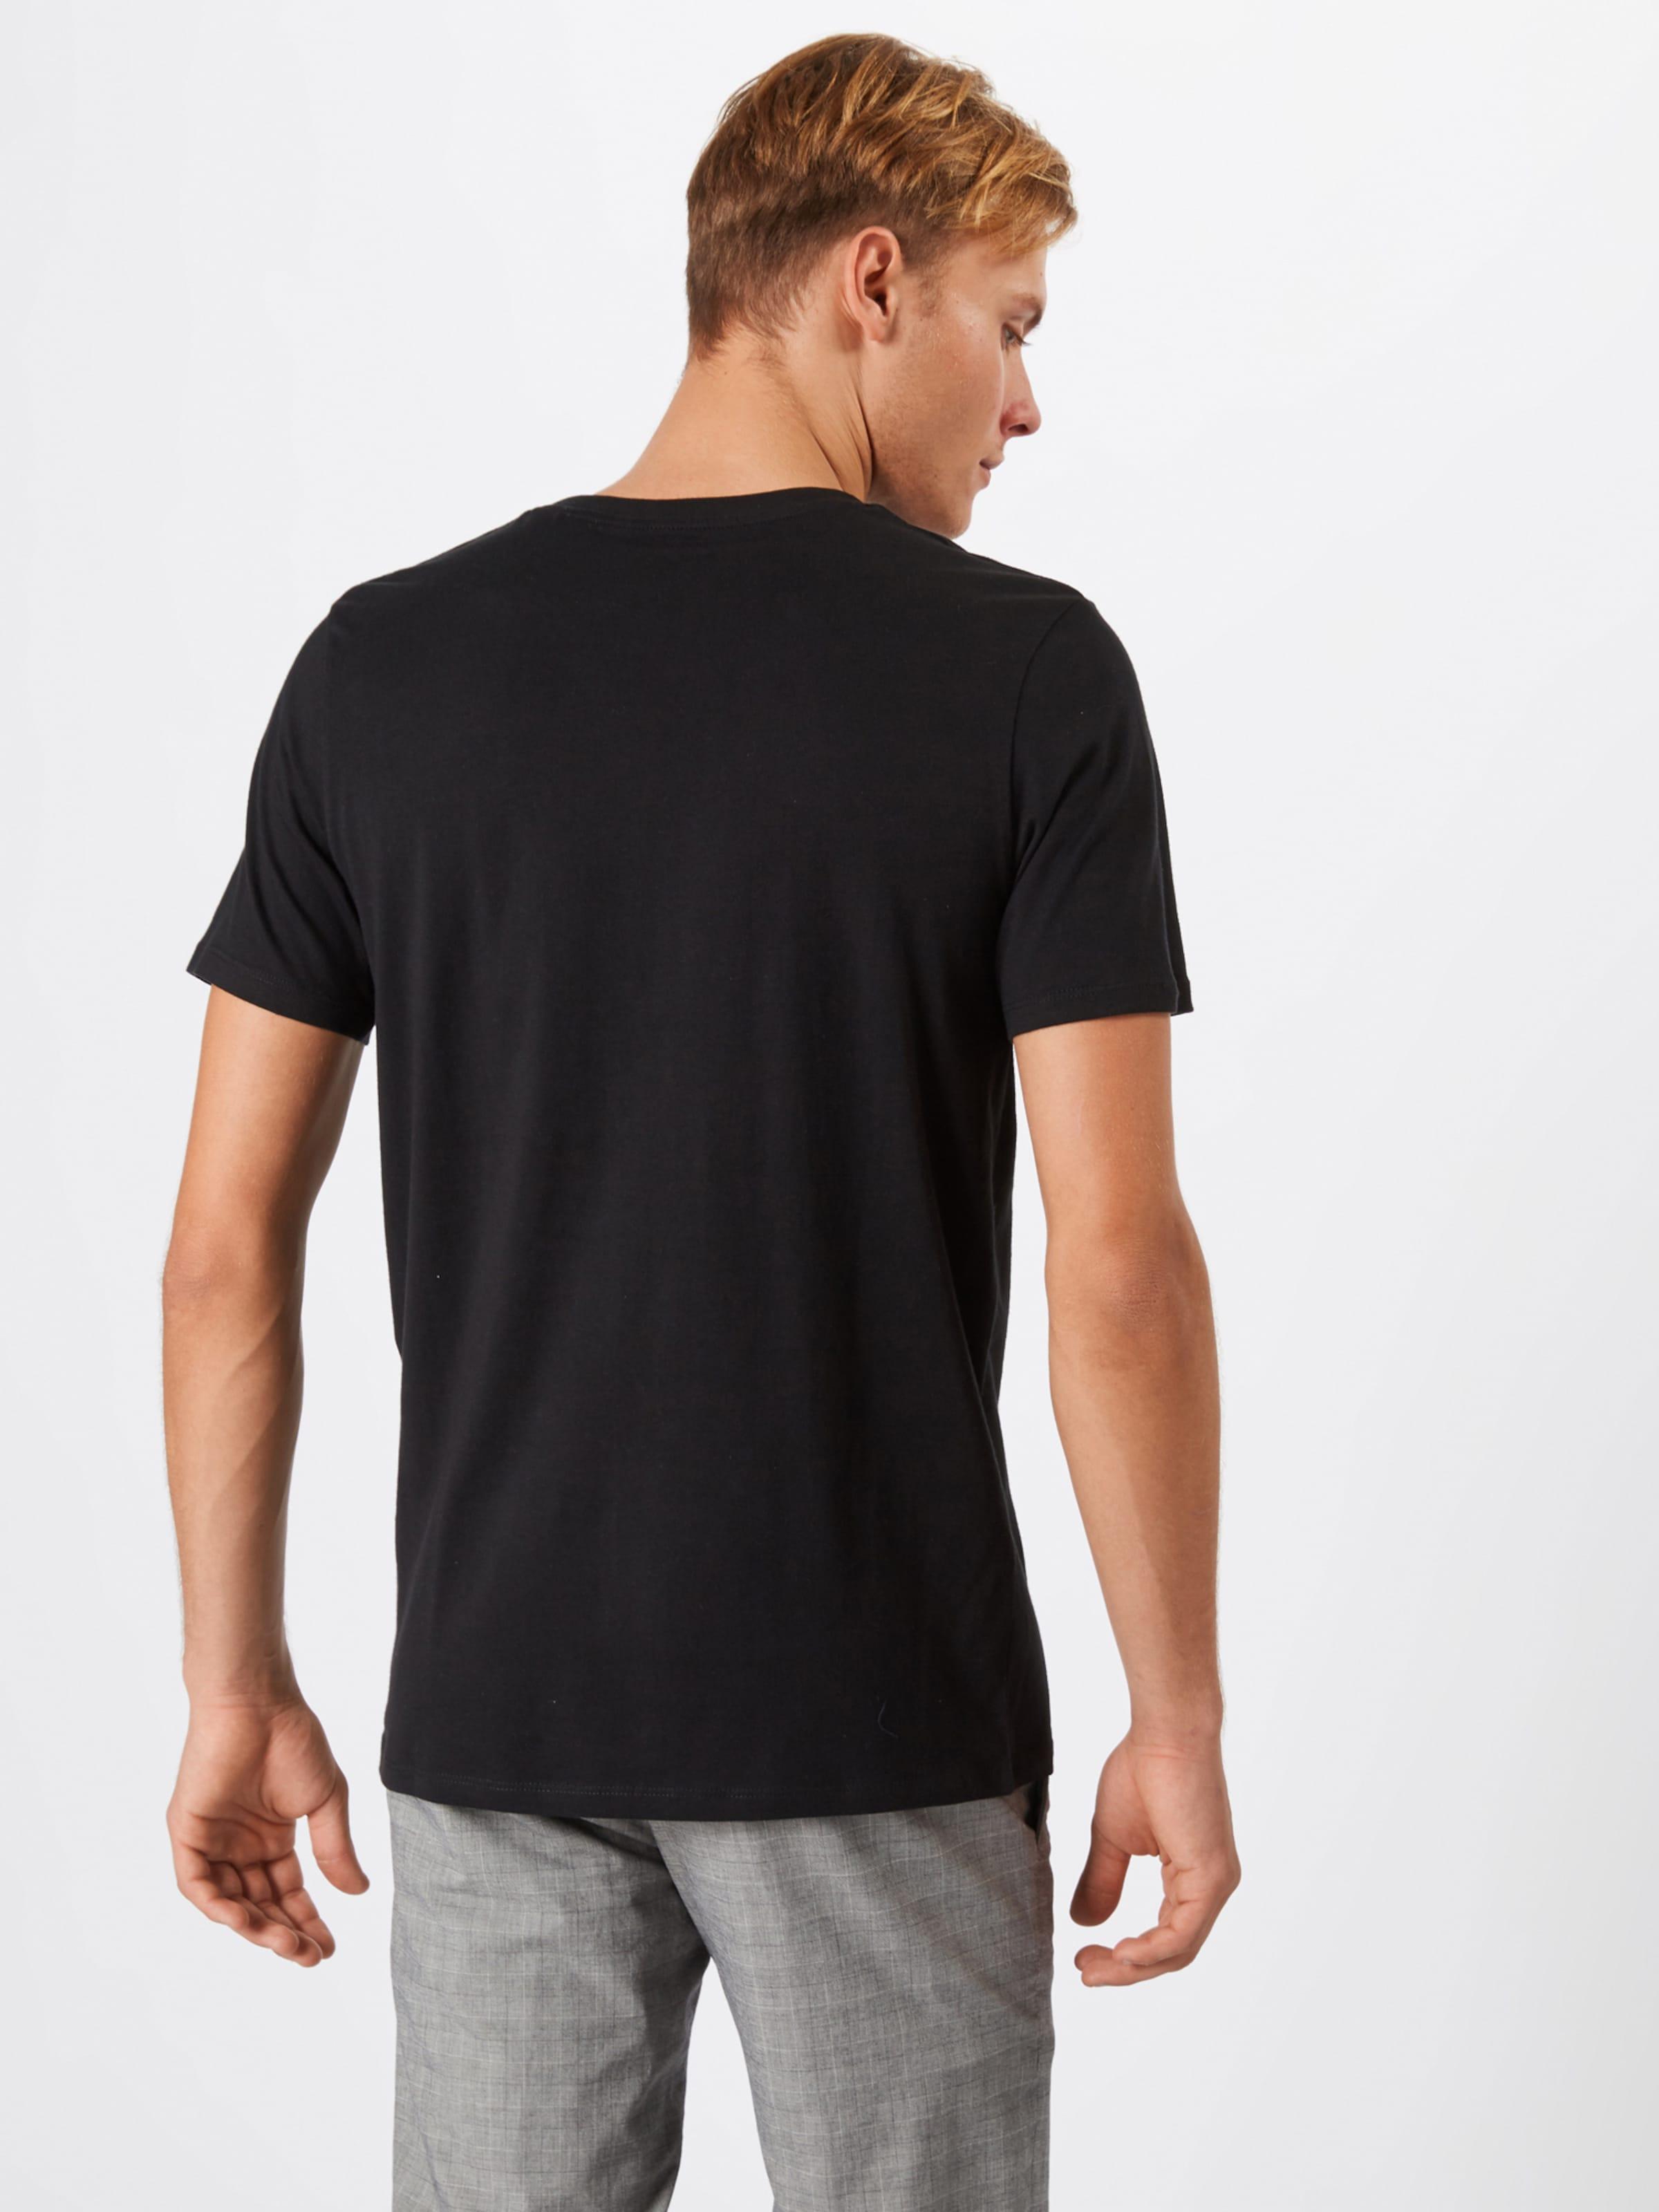 Jones T Mélange shirt De Jackamp; En CouleursNoir shQrxBtdCo